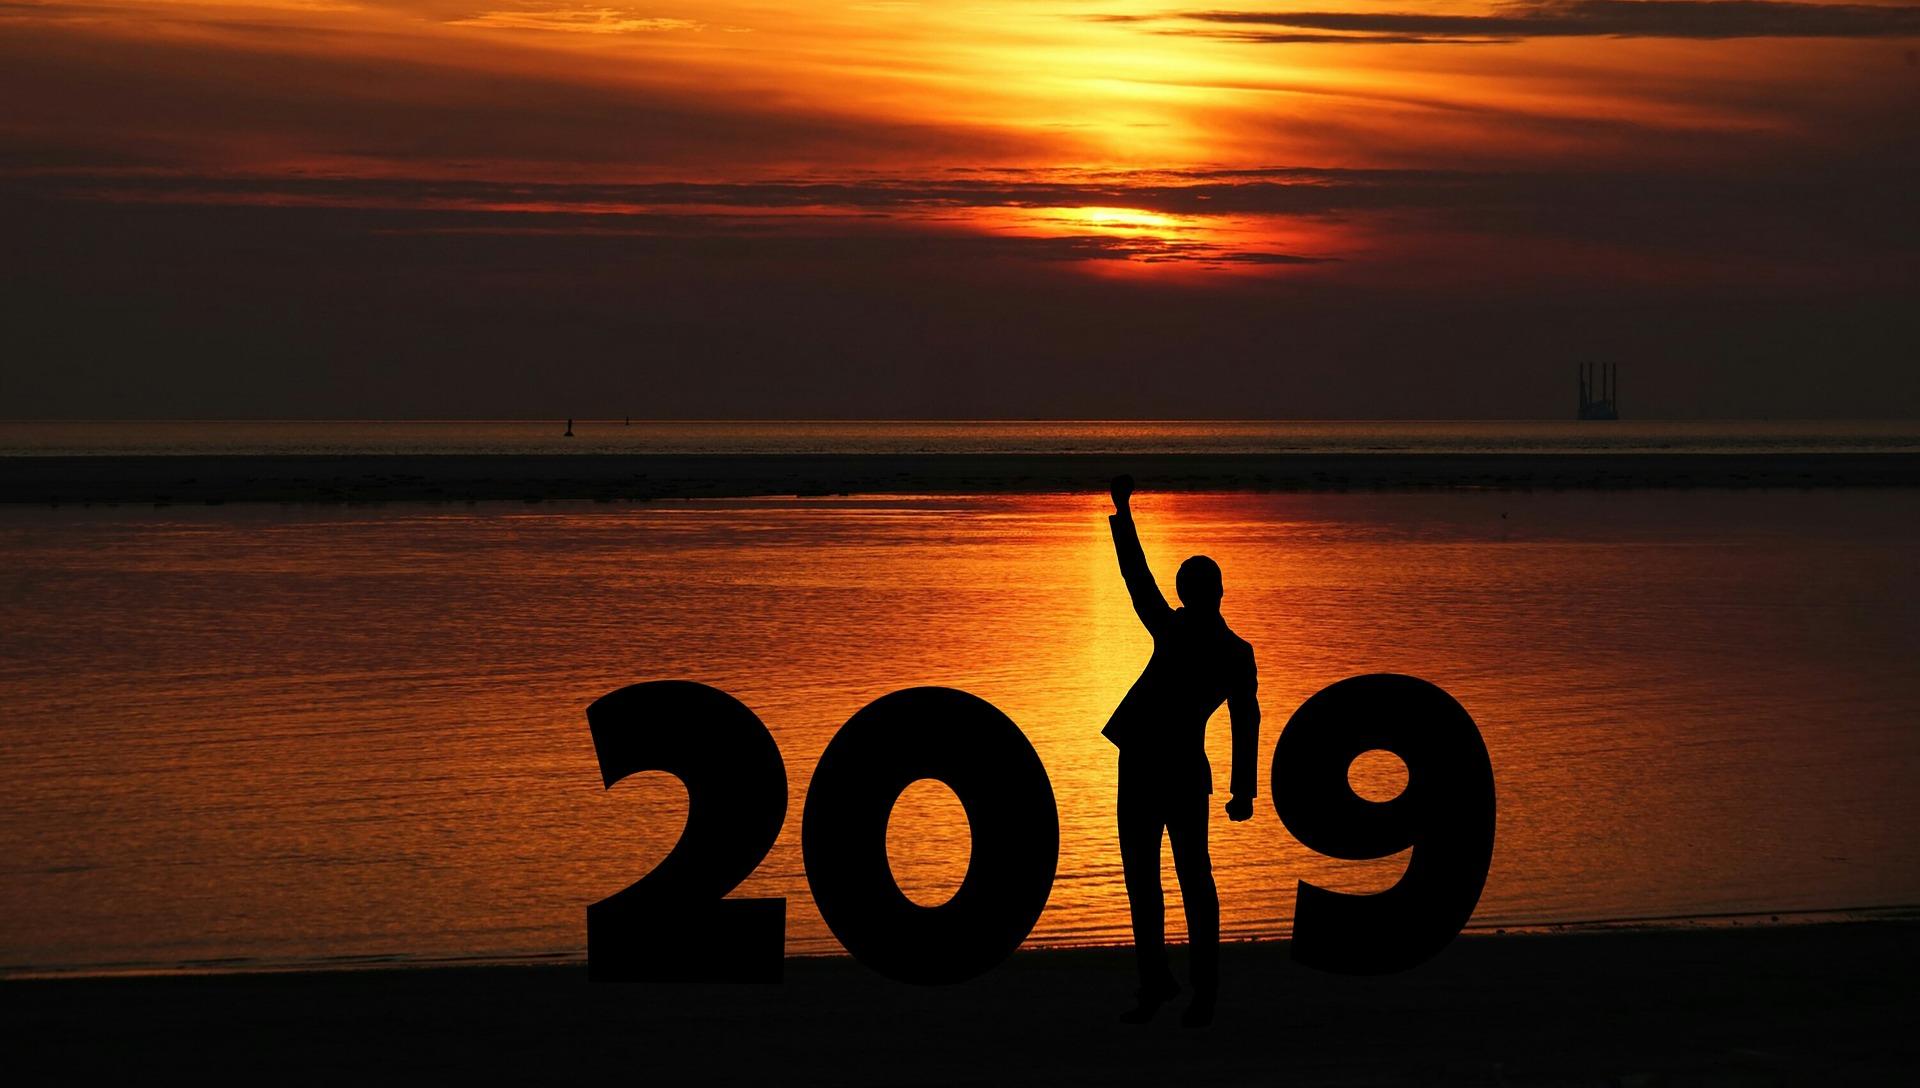 So Long, 2019!